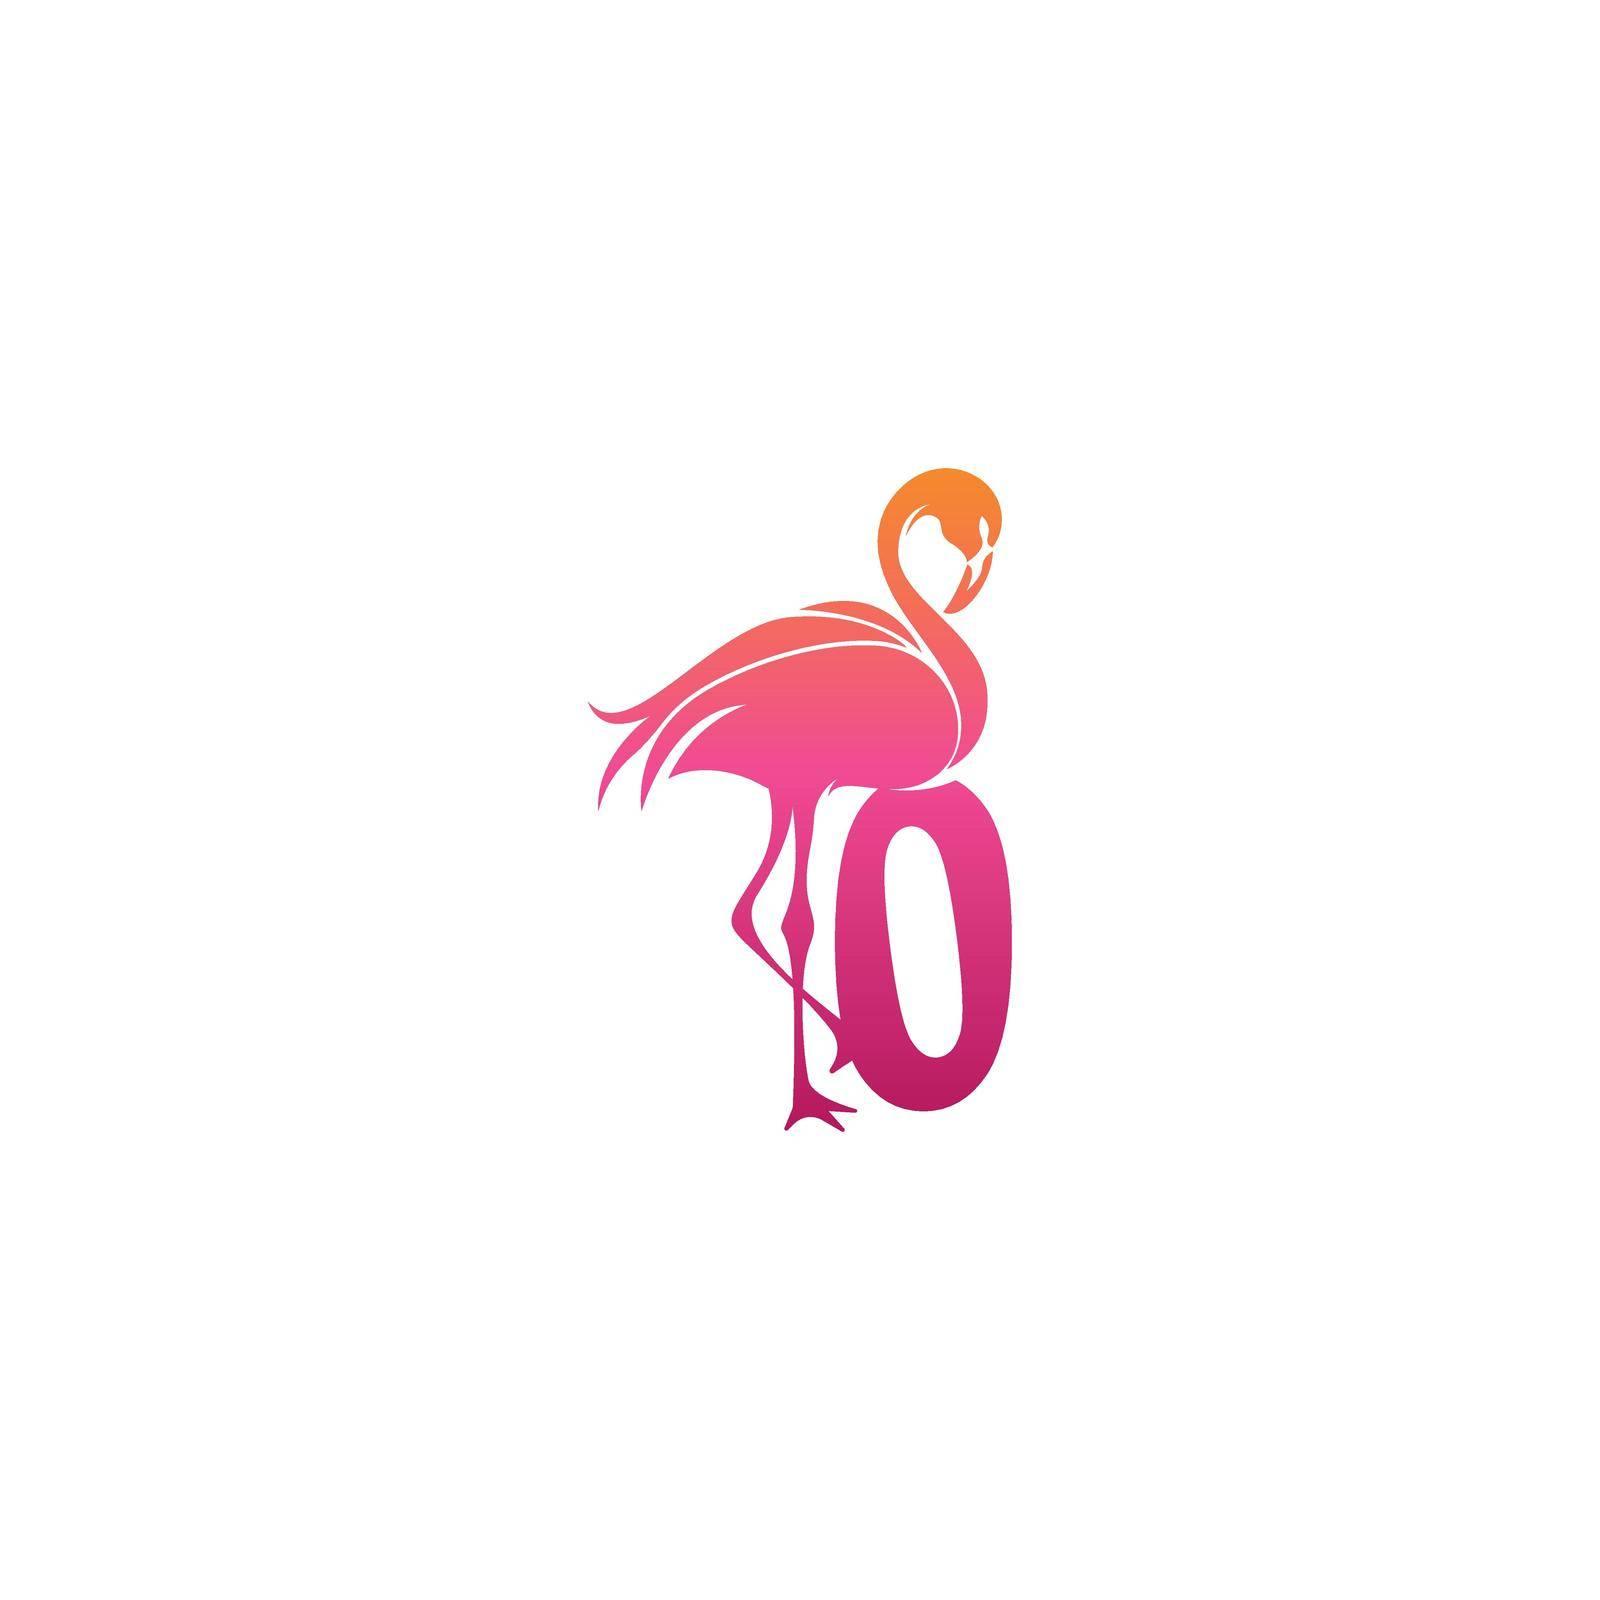 Flamingo bird icon with Number zero Logo design vector template